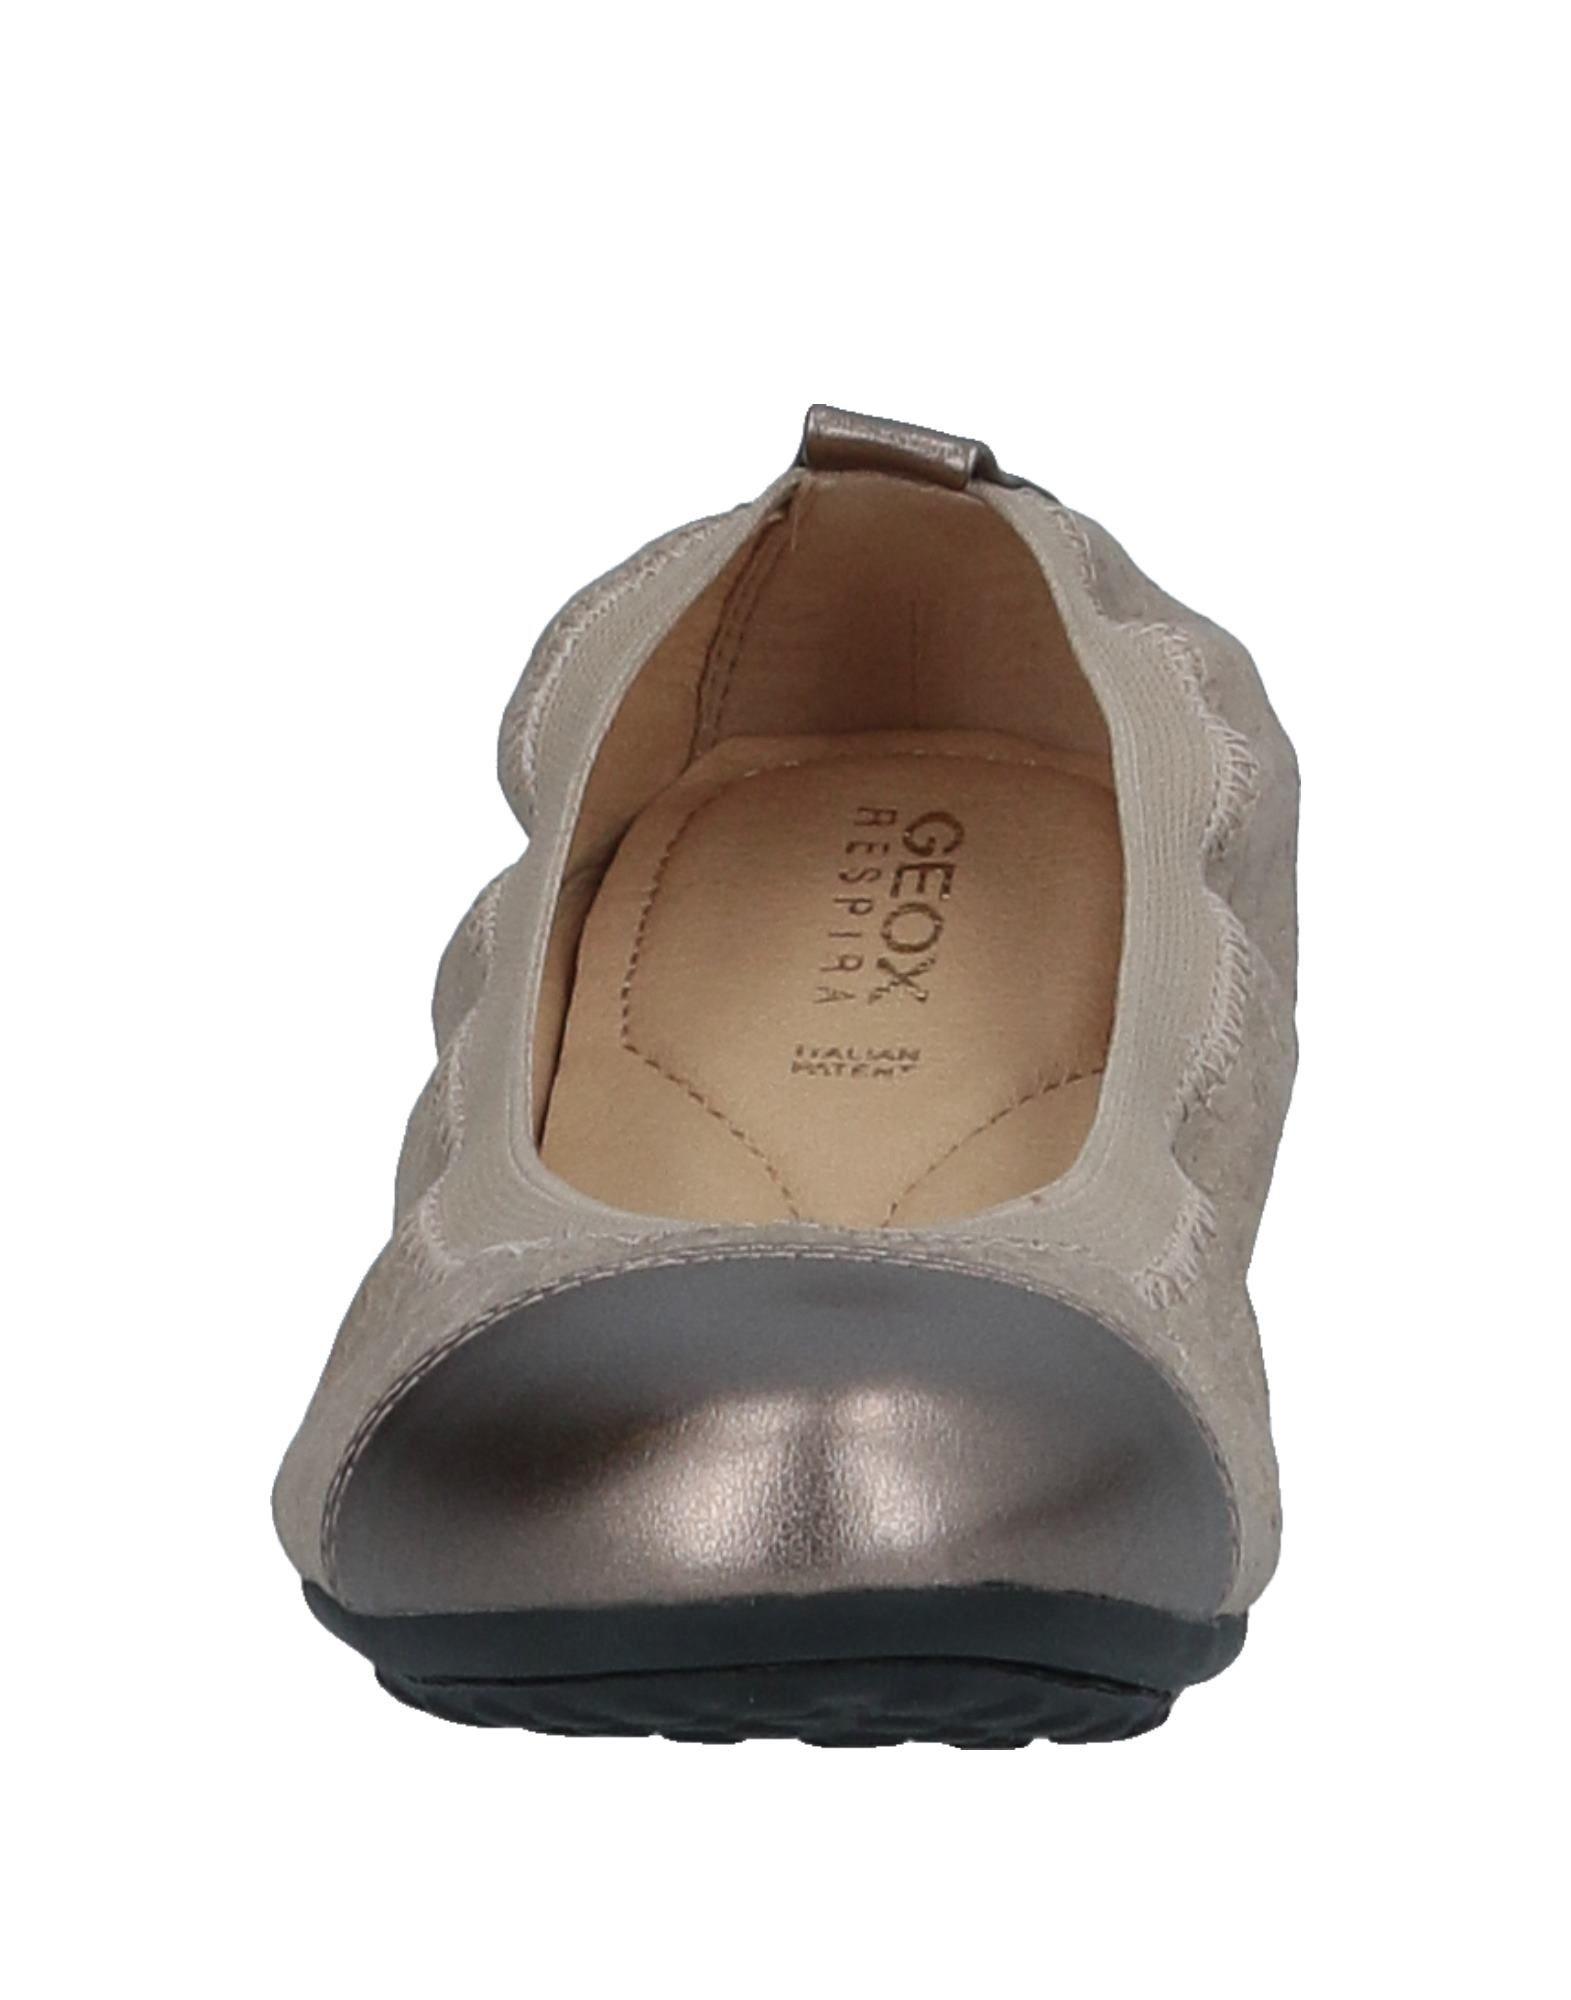 Geox Ballerinas Damen  11540288IU 11540288IU  6159ab